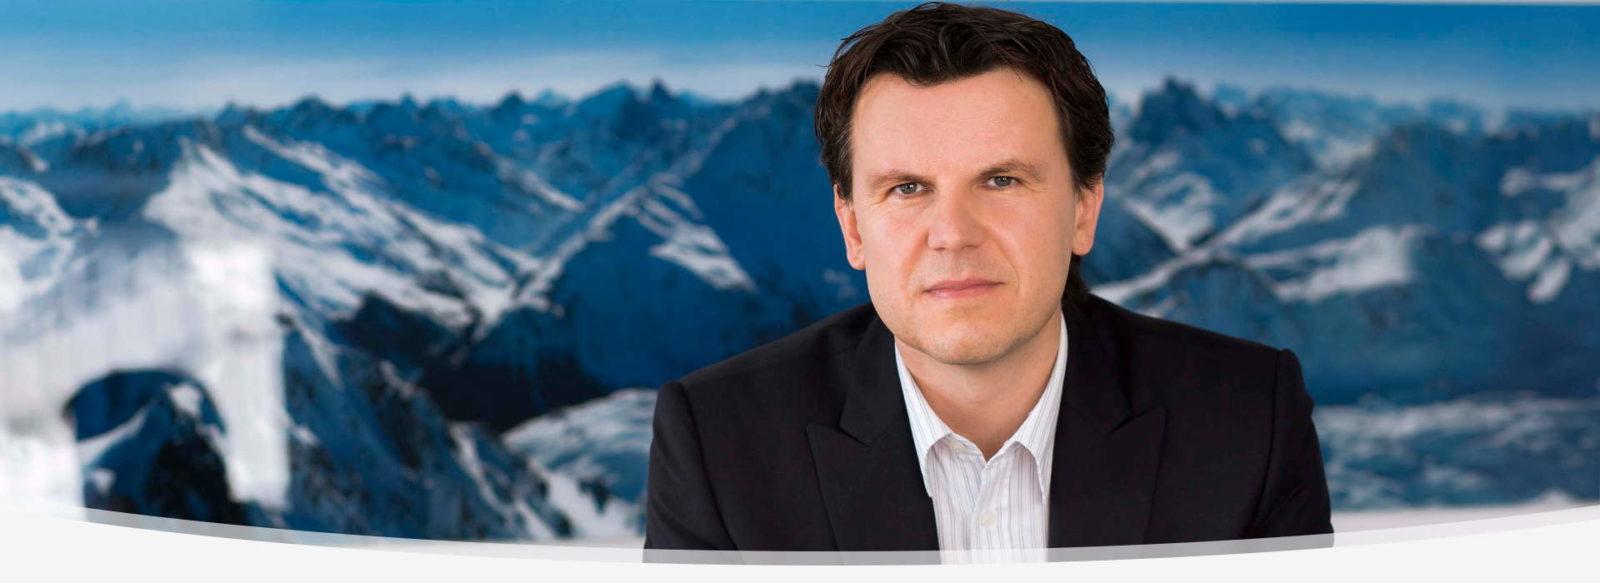 Rechtsanwalt Alexander Kern aus München